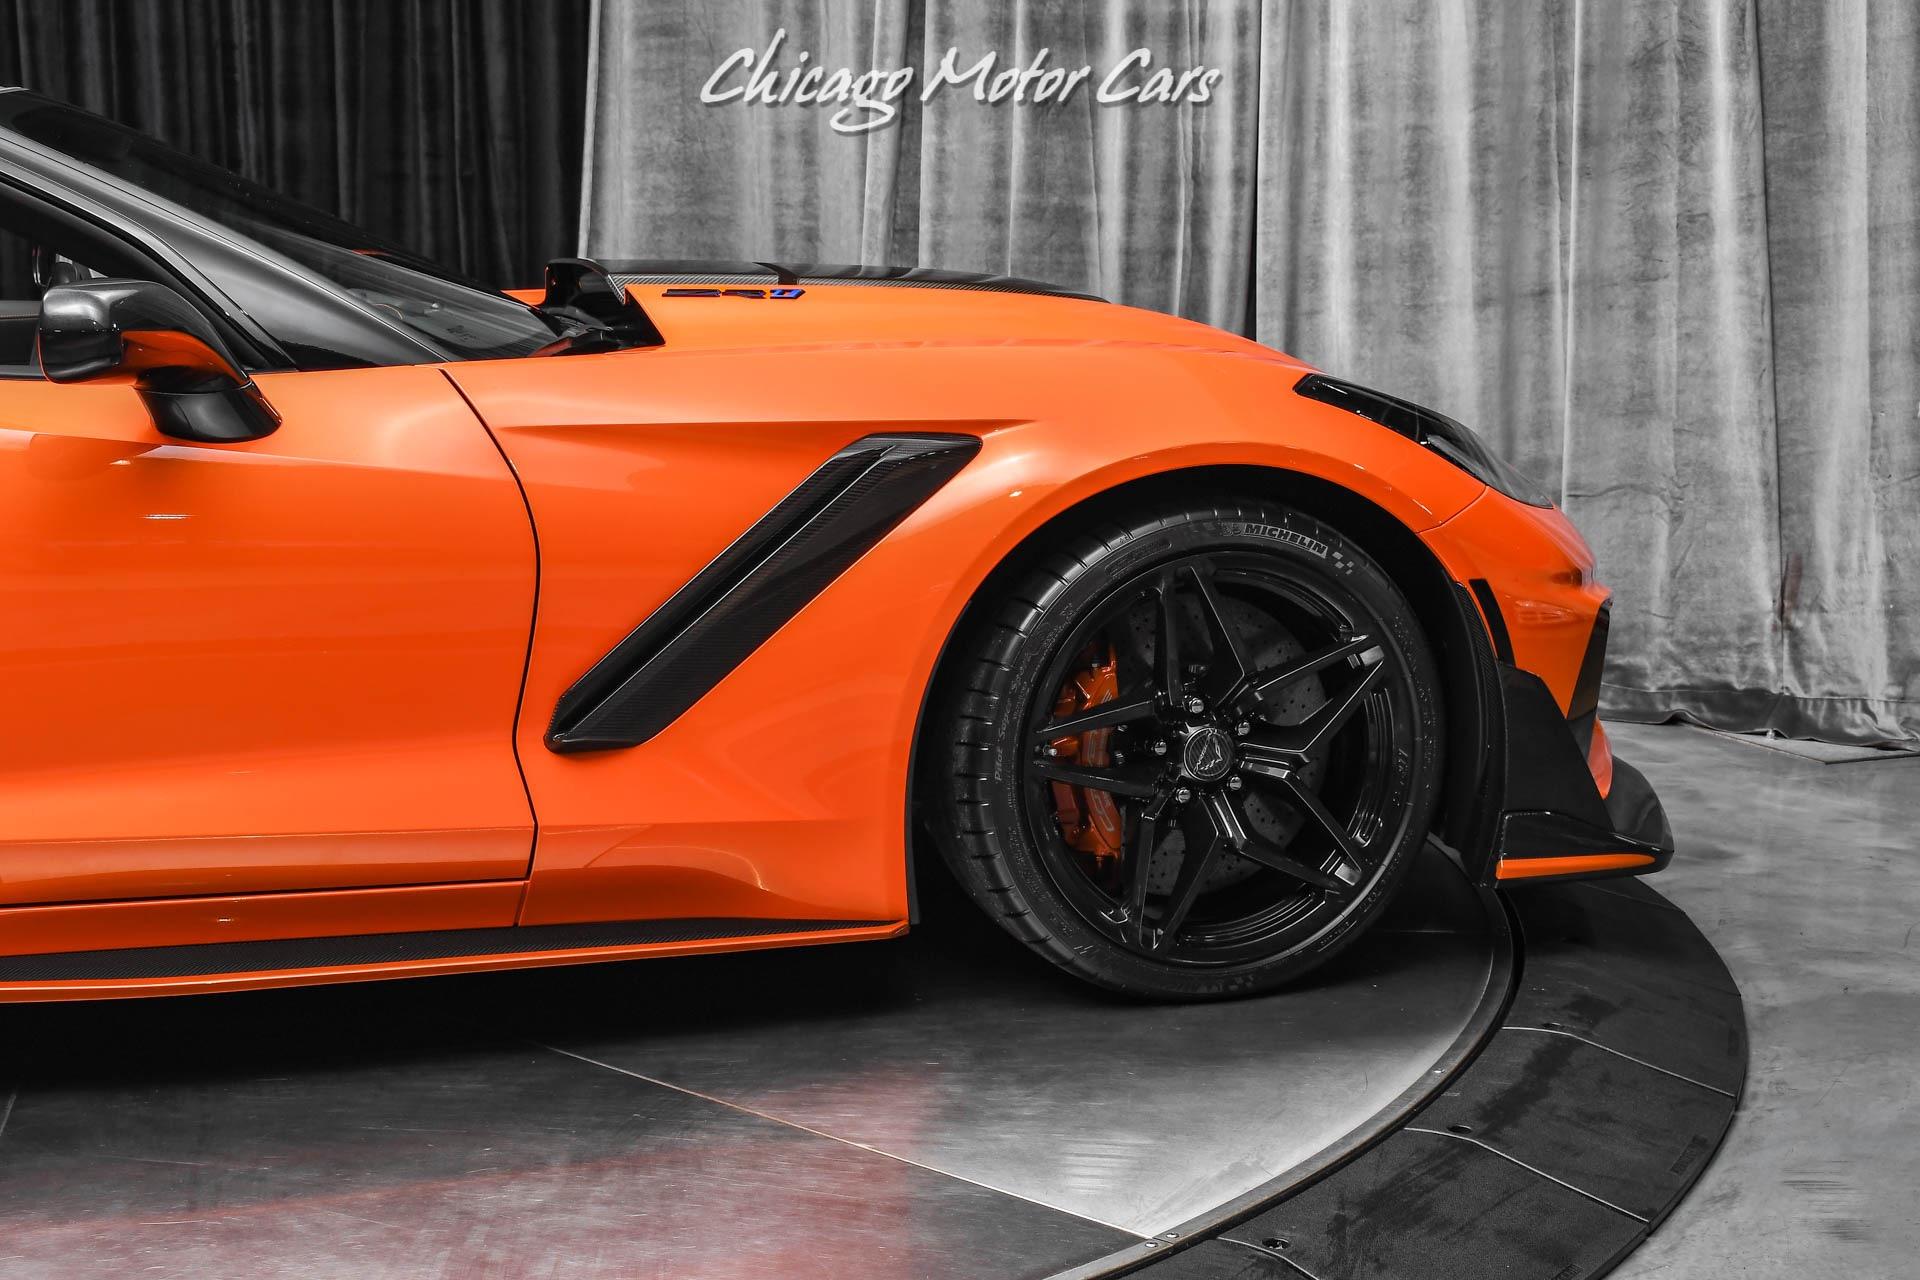 Used-2019-Chevrolet-Corvette-ZR1-3ZR-ZTK-MANUAL-TRANSMISSION-900WHP